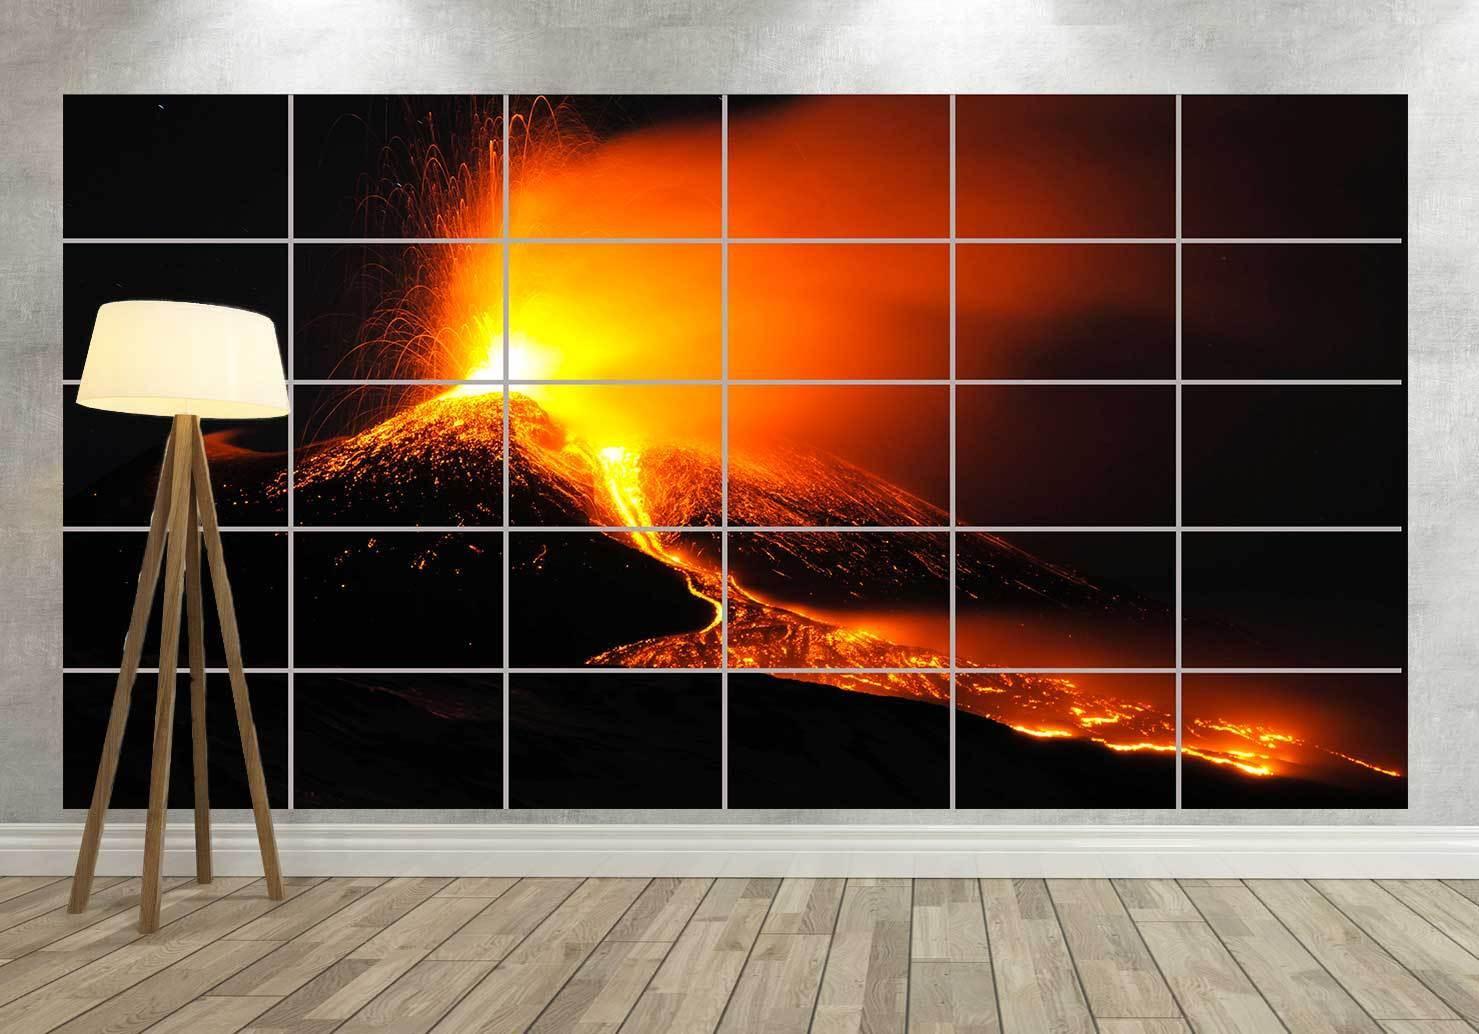 Volcano Eruption Volcano in Eruption Giant Poster Home Deco Salon 252cmx150